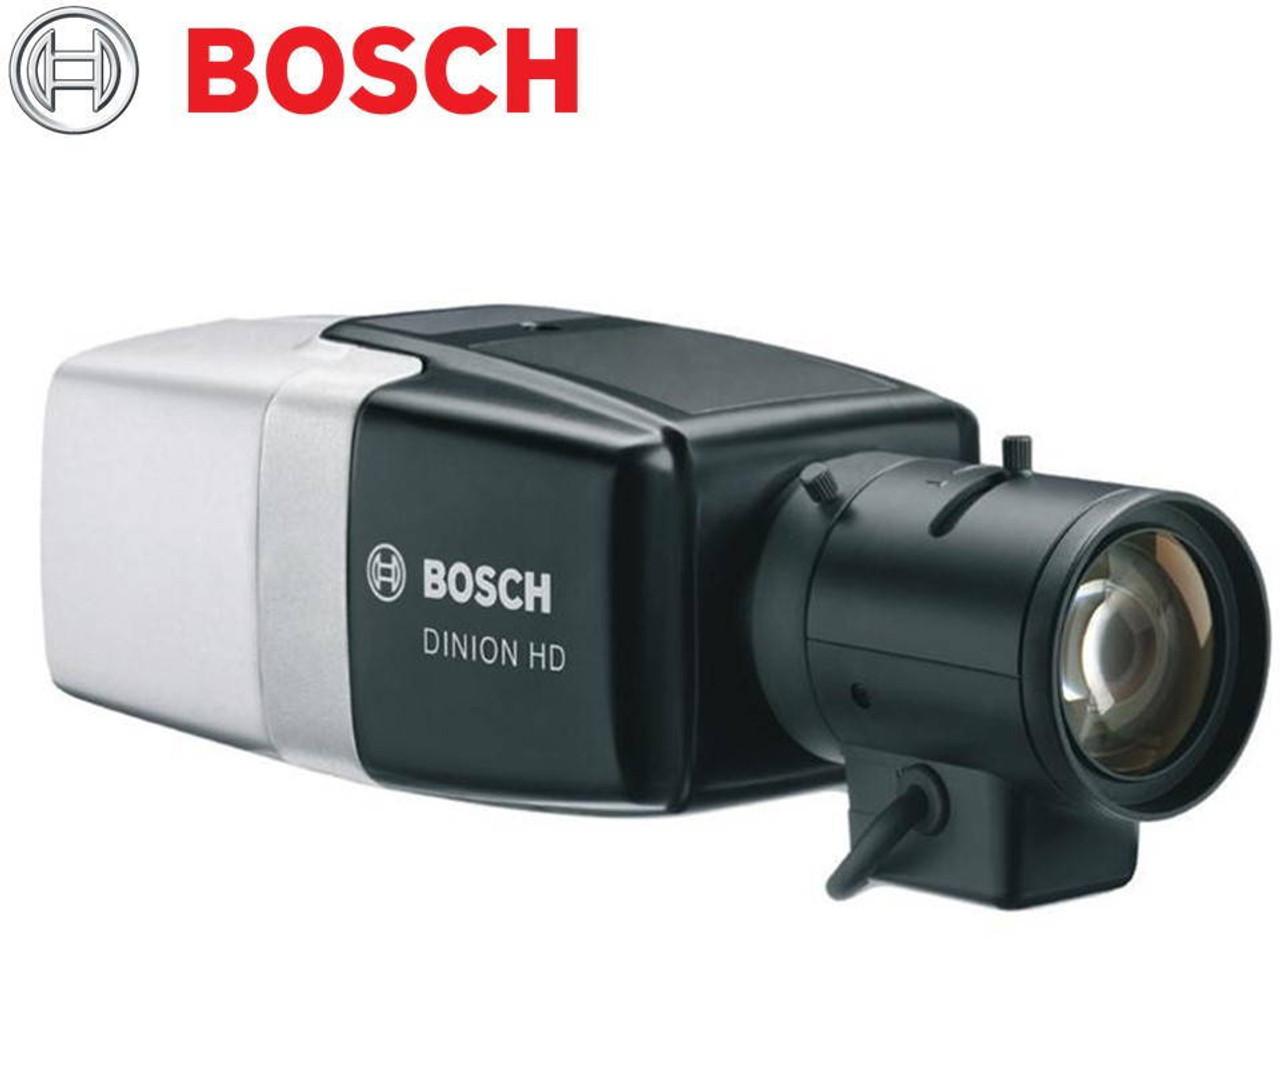 Bosch NBN 71022 BA DINION IP 7000 HD 2MP Box Security Camera